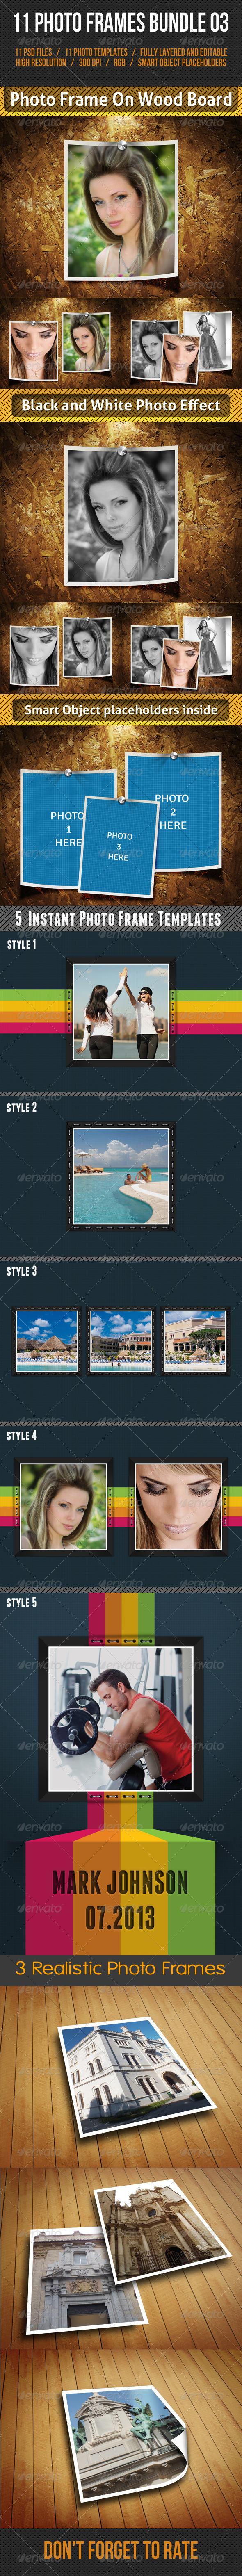 GraphicRiver 11 Photo Frames Bundle 03 7747157